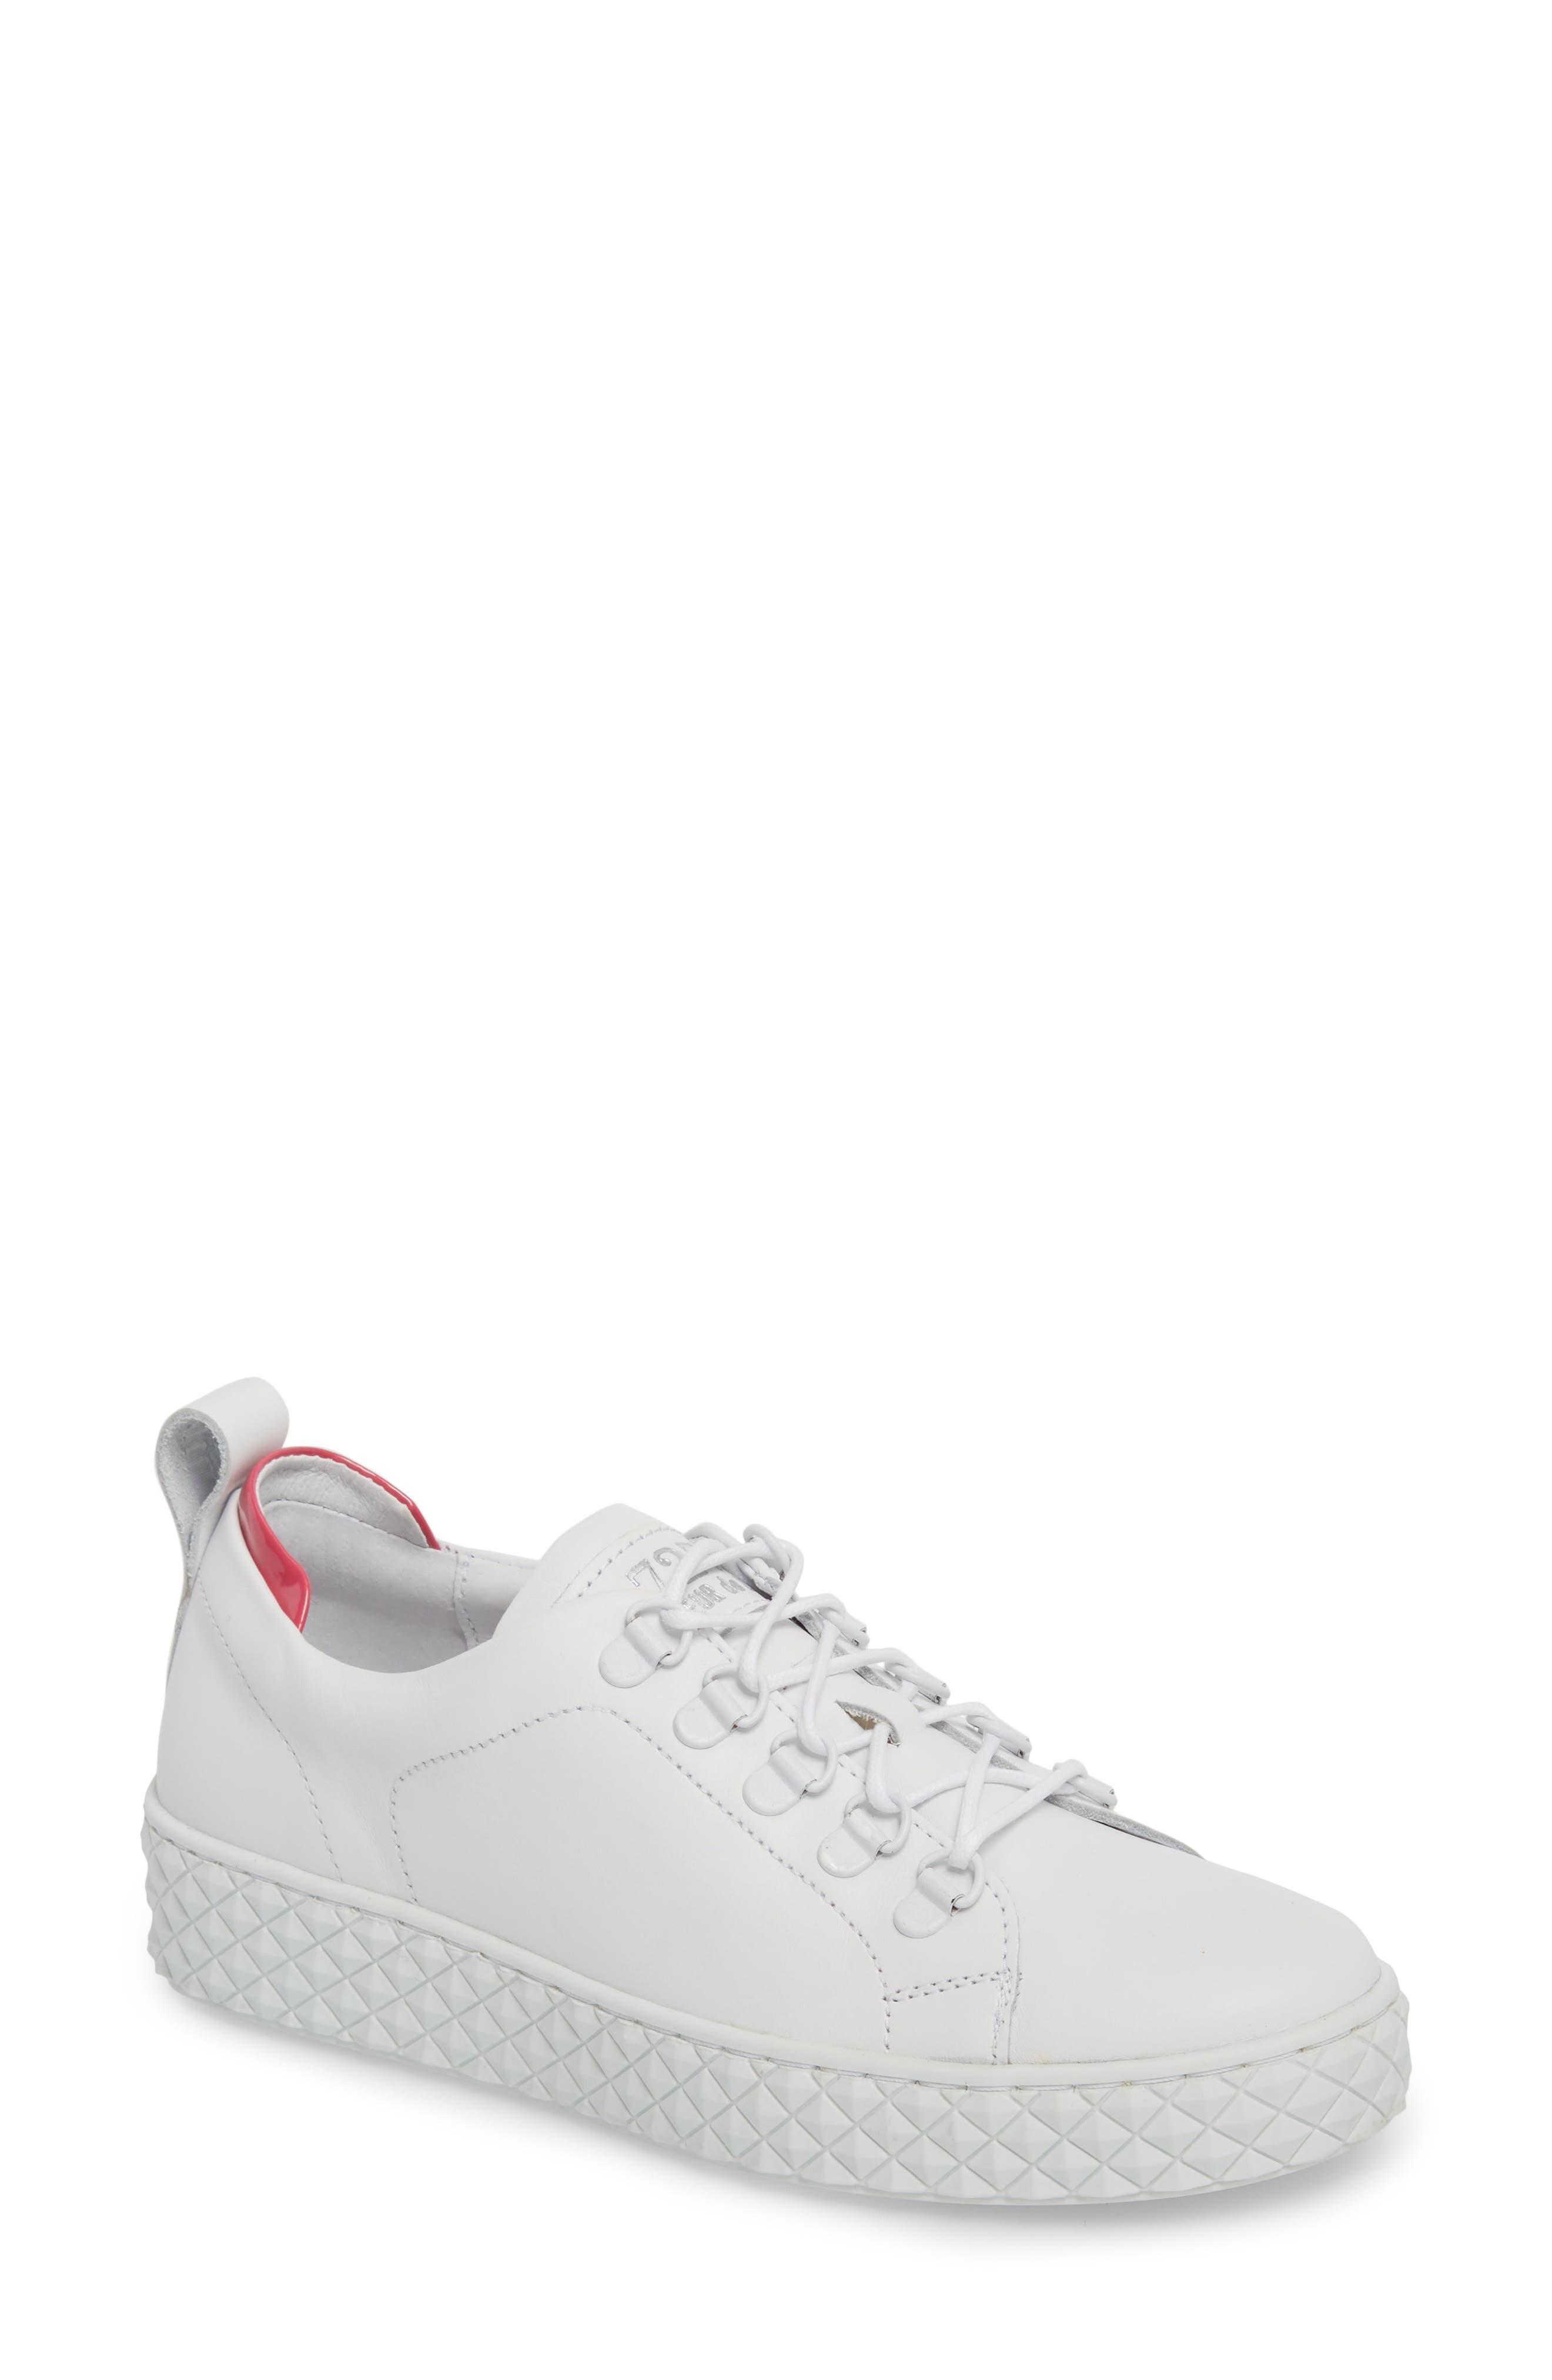 Sol Sneaker,                         Main,                         color, Optic White/ Fuchsia Leather